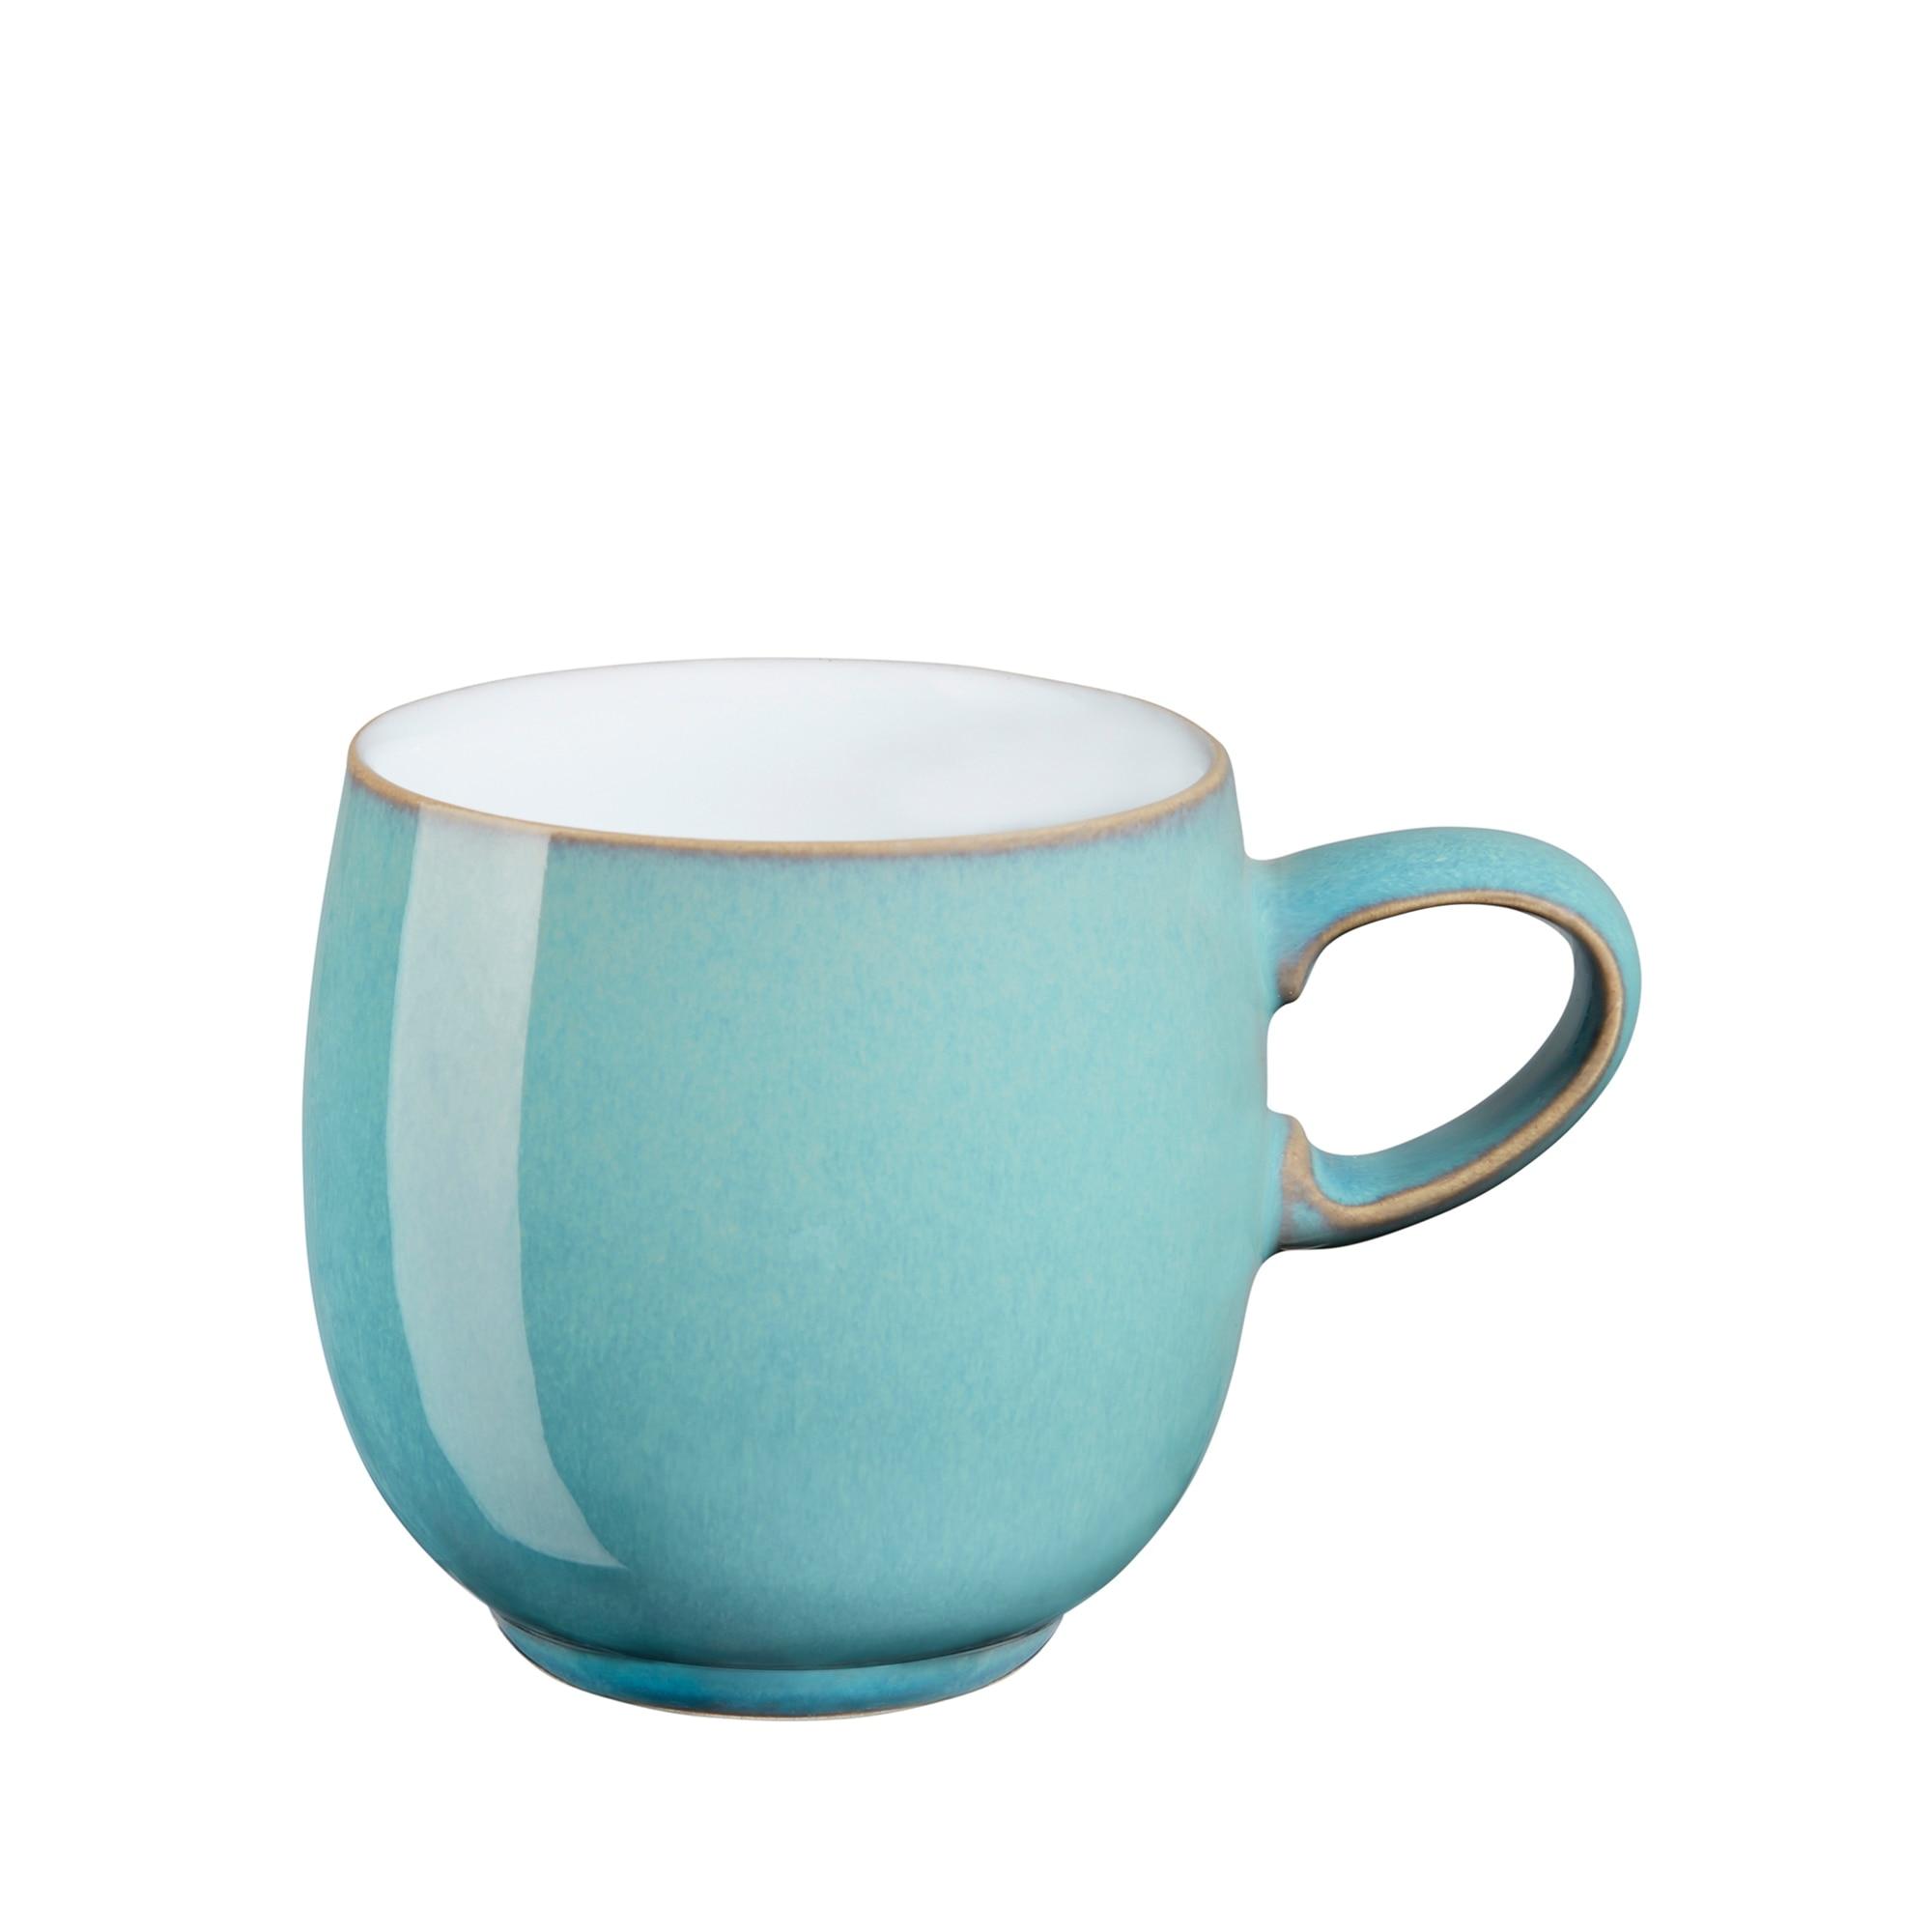 Compare prices for Denby Azure Small Curve Mug